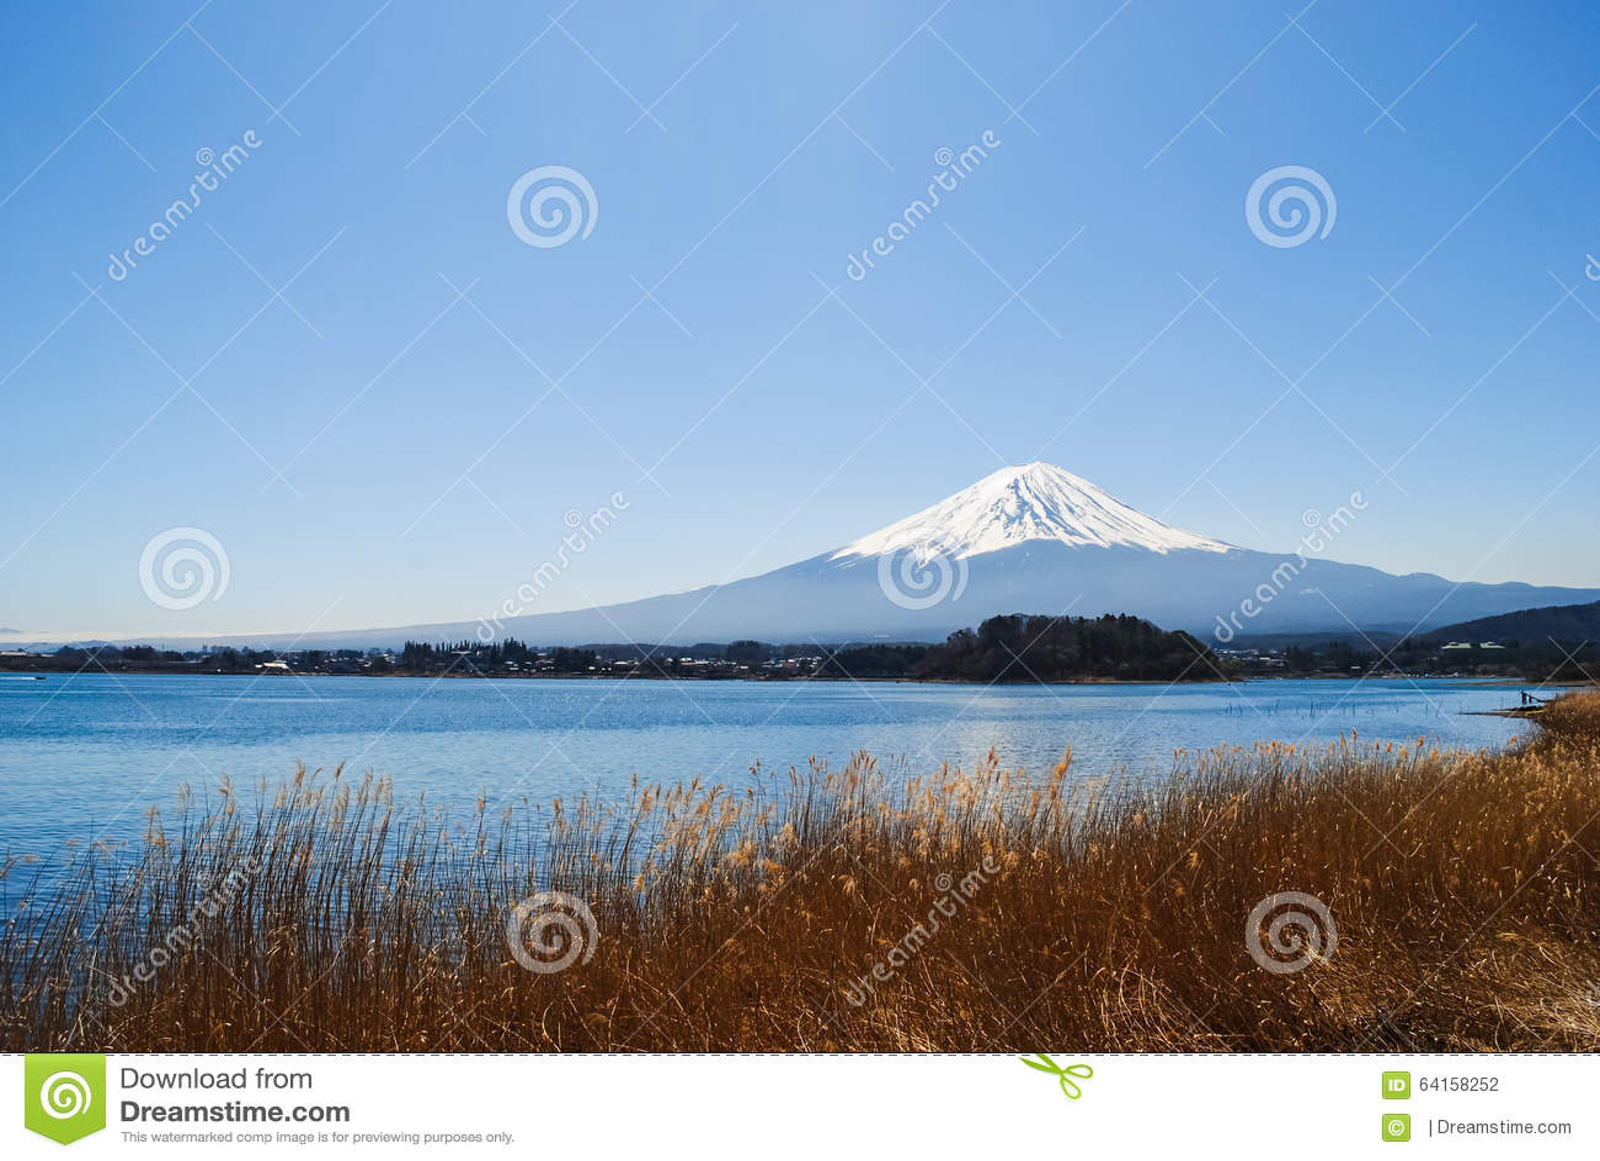 Montaña de Fuji en el lago Kawaguchiko